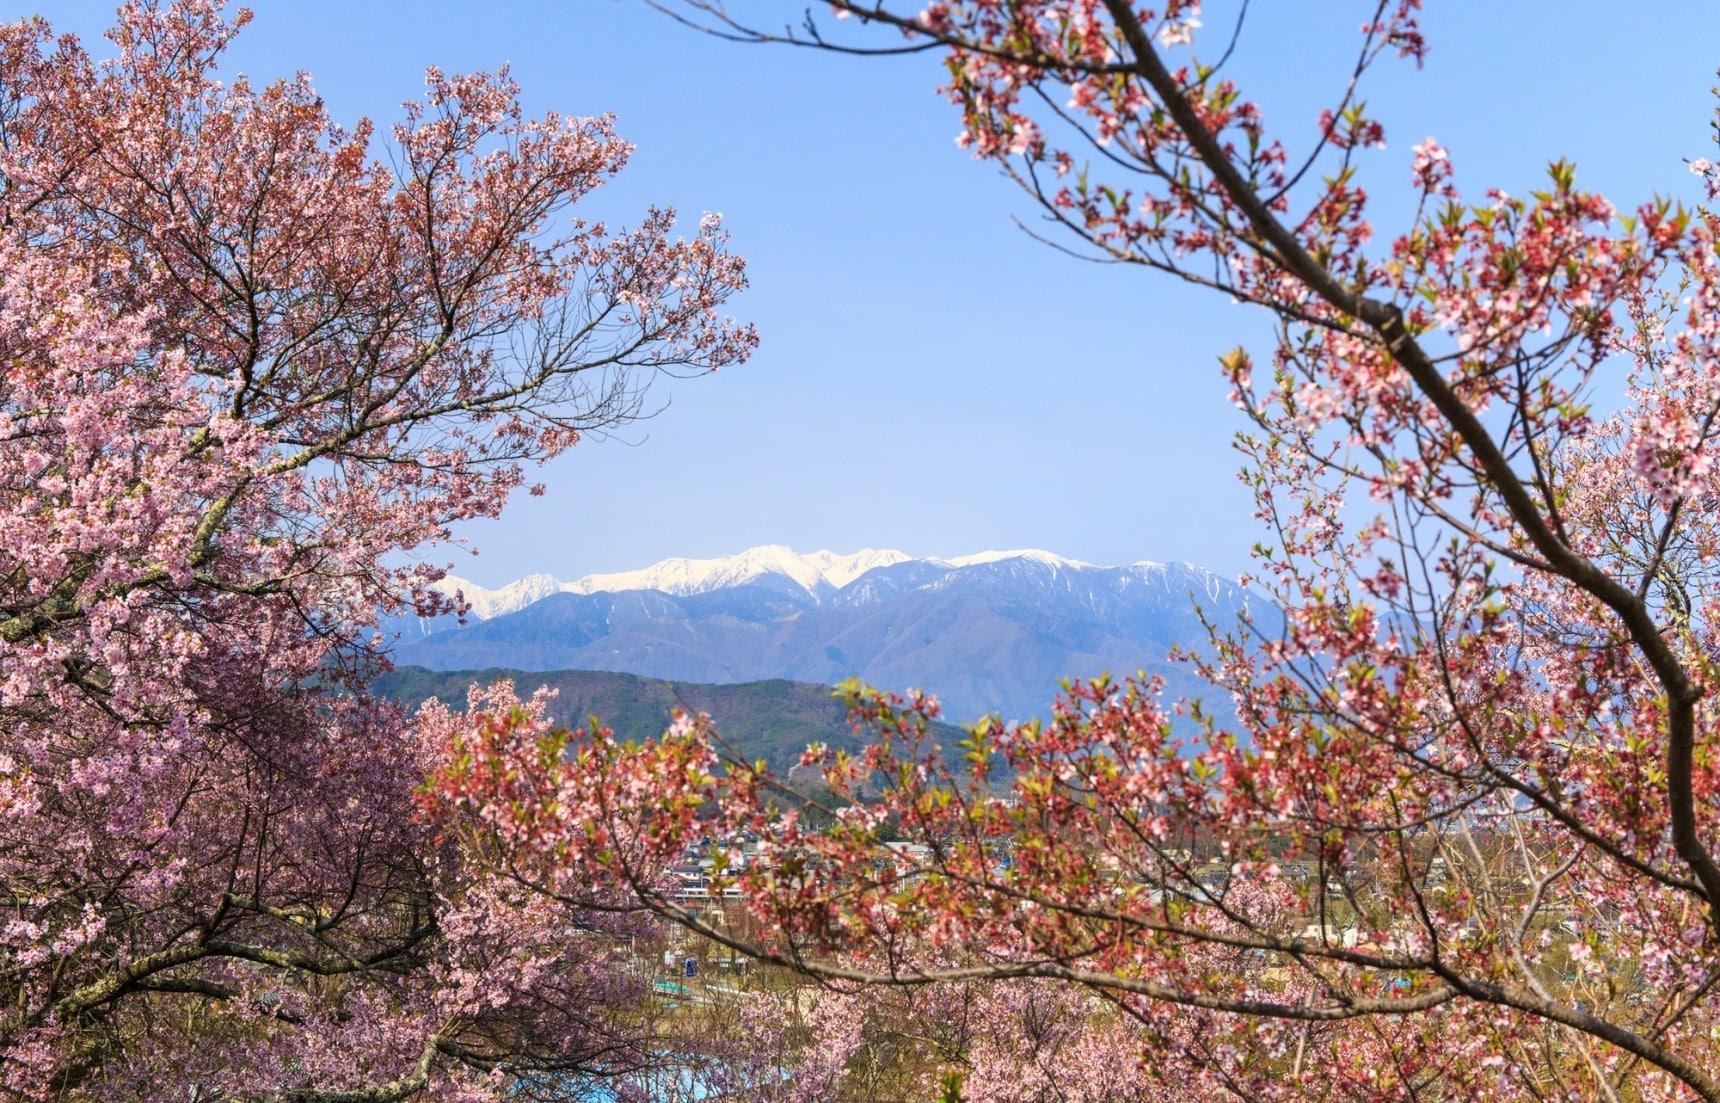 Japan's Top 5 'Hanami' Hikes